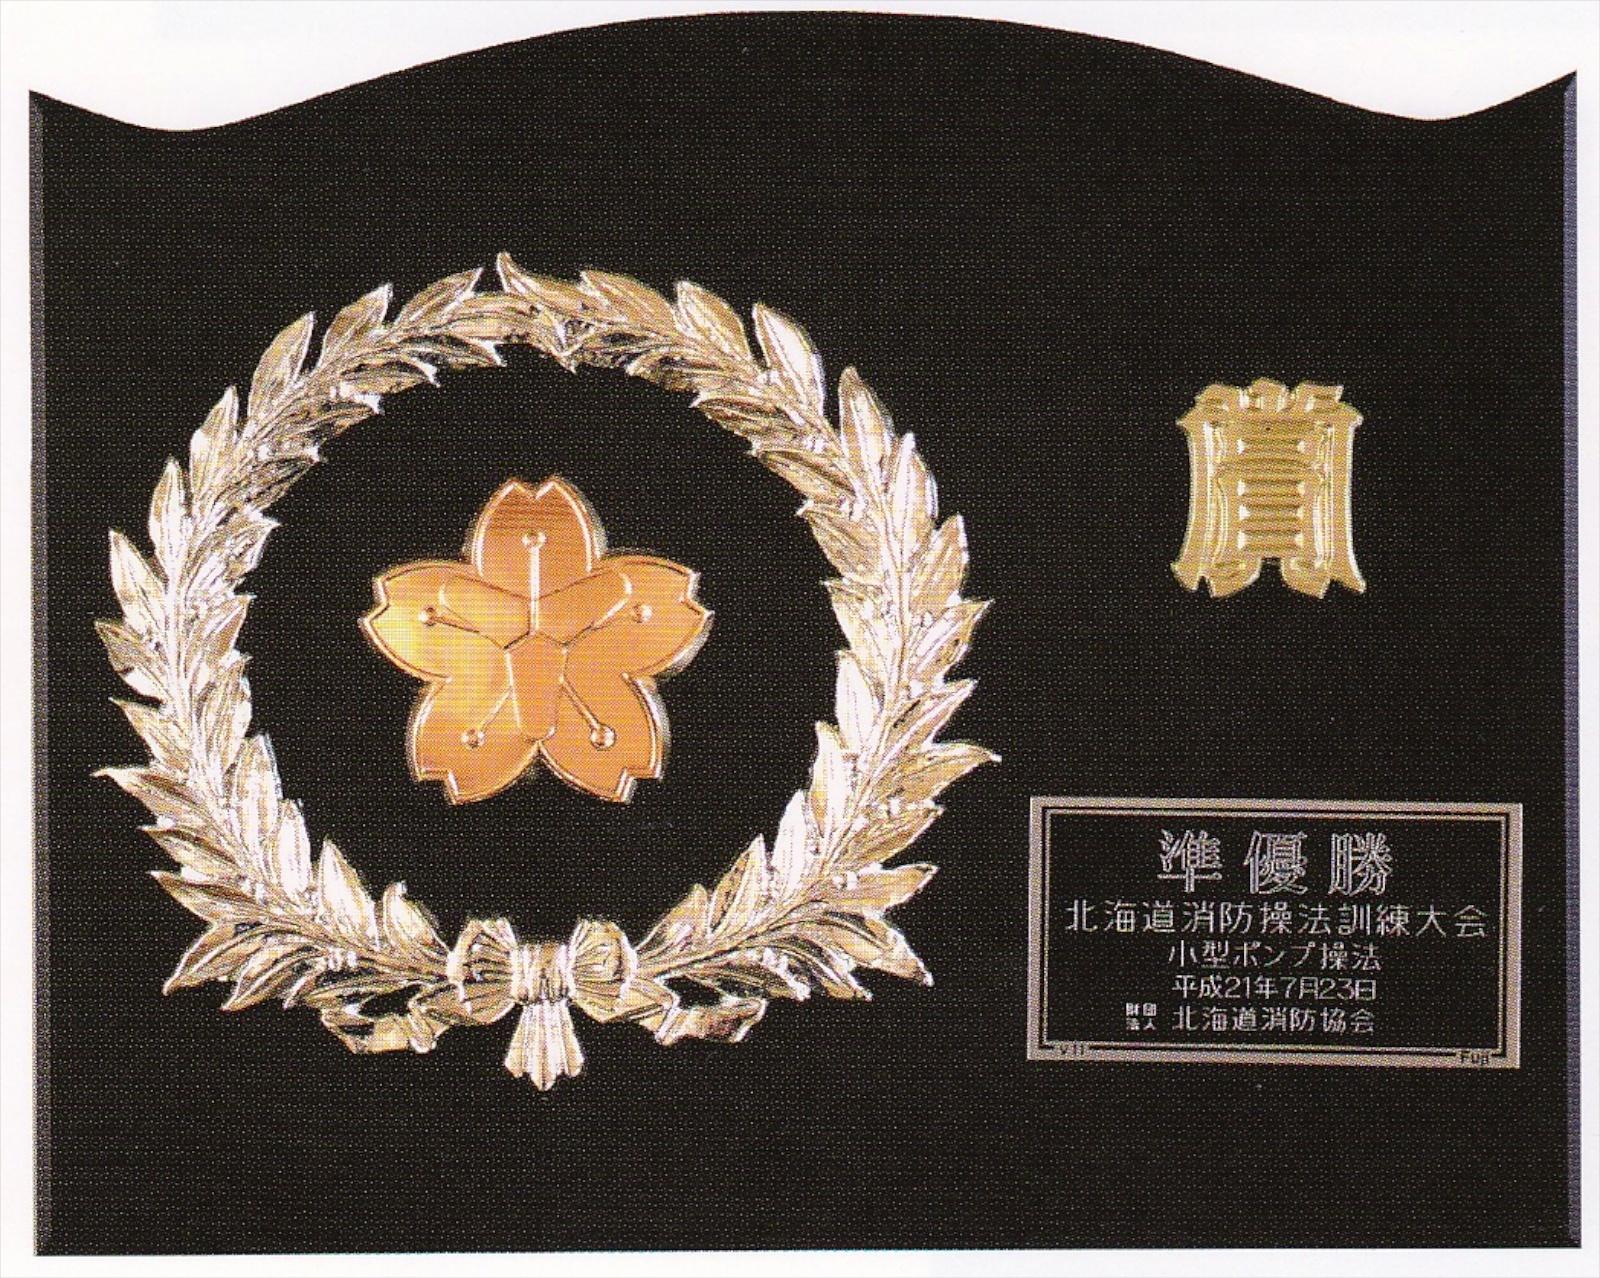 Photo: 北海道消防操法訓練大会・小型ポンプ操法 準優勝・盾 平成21年(2009年)